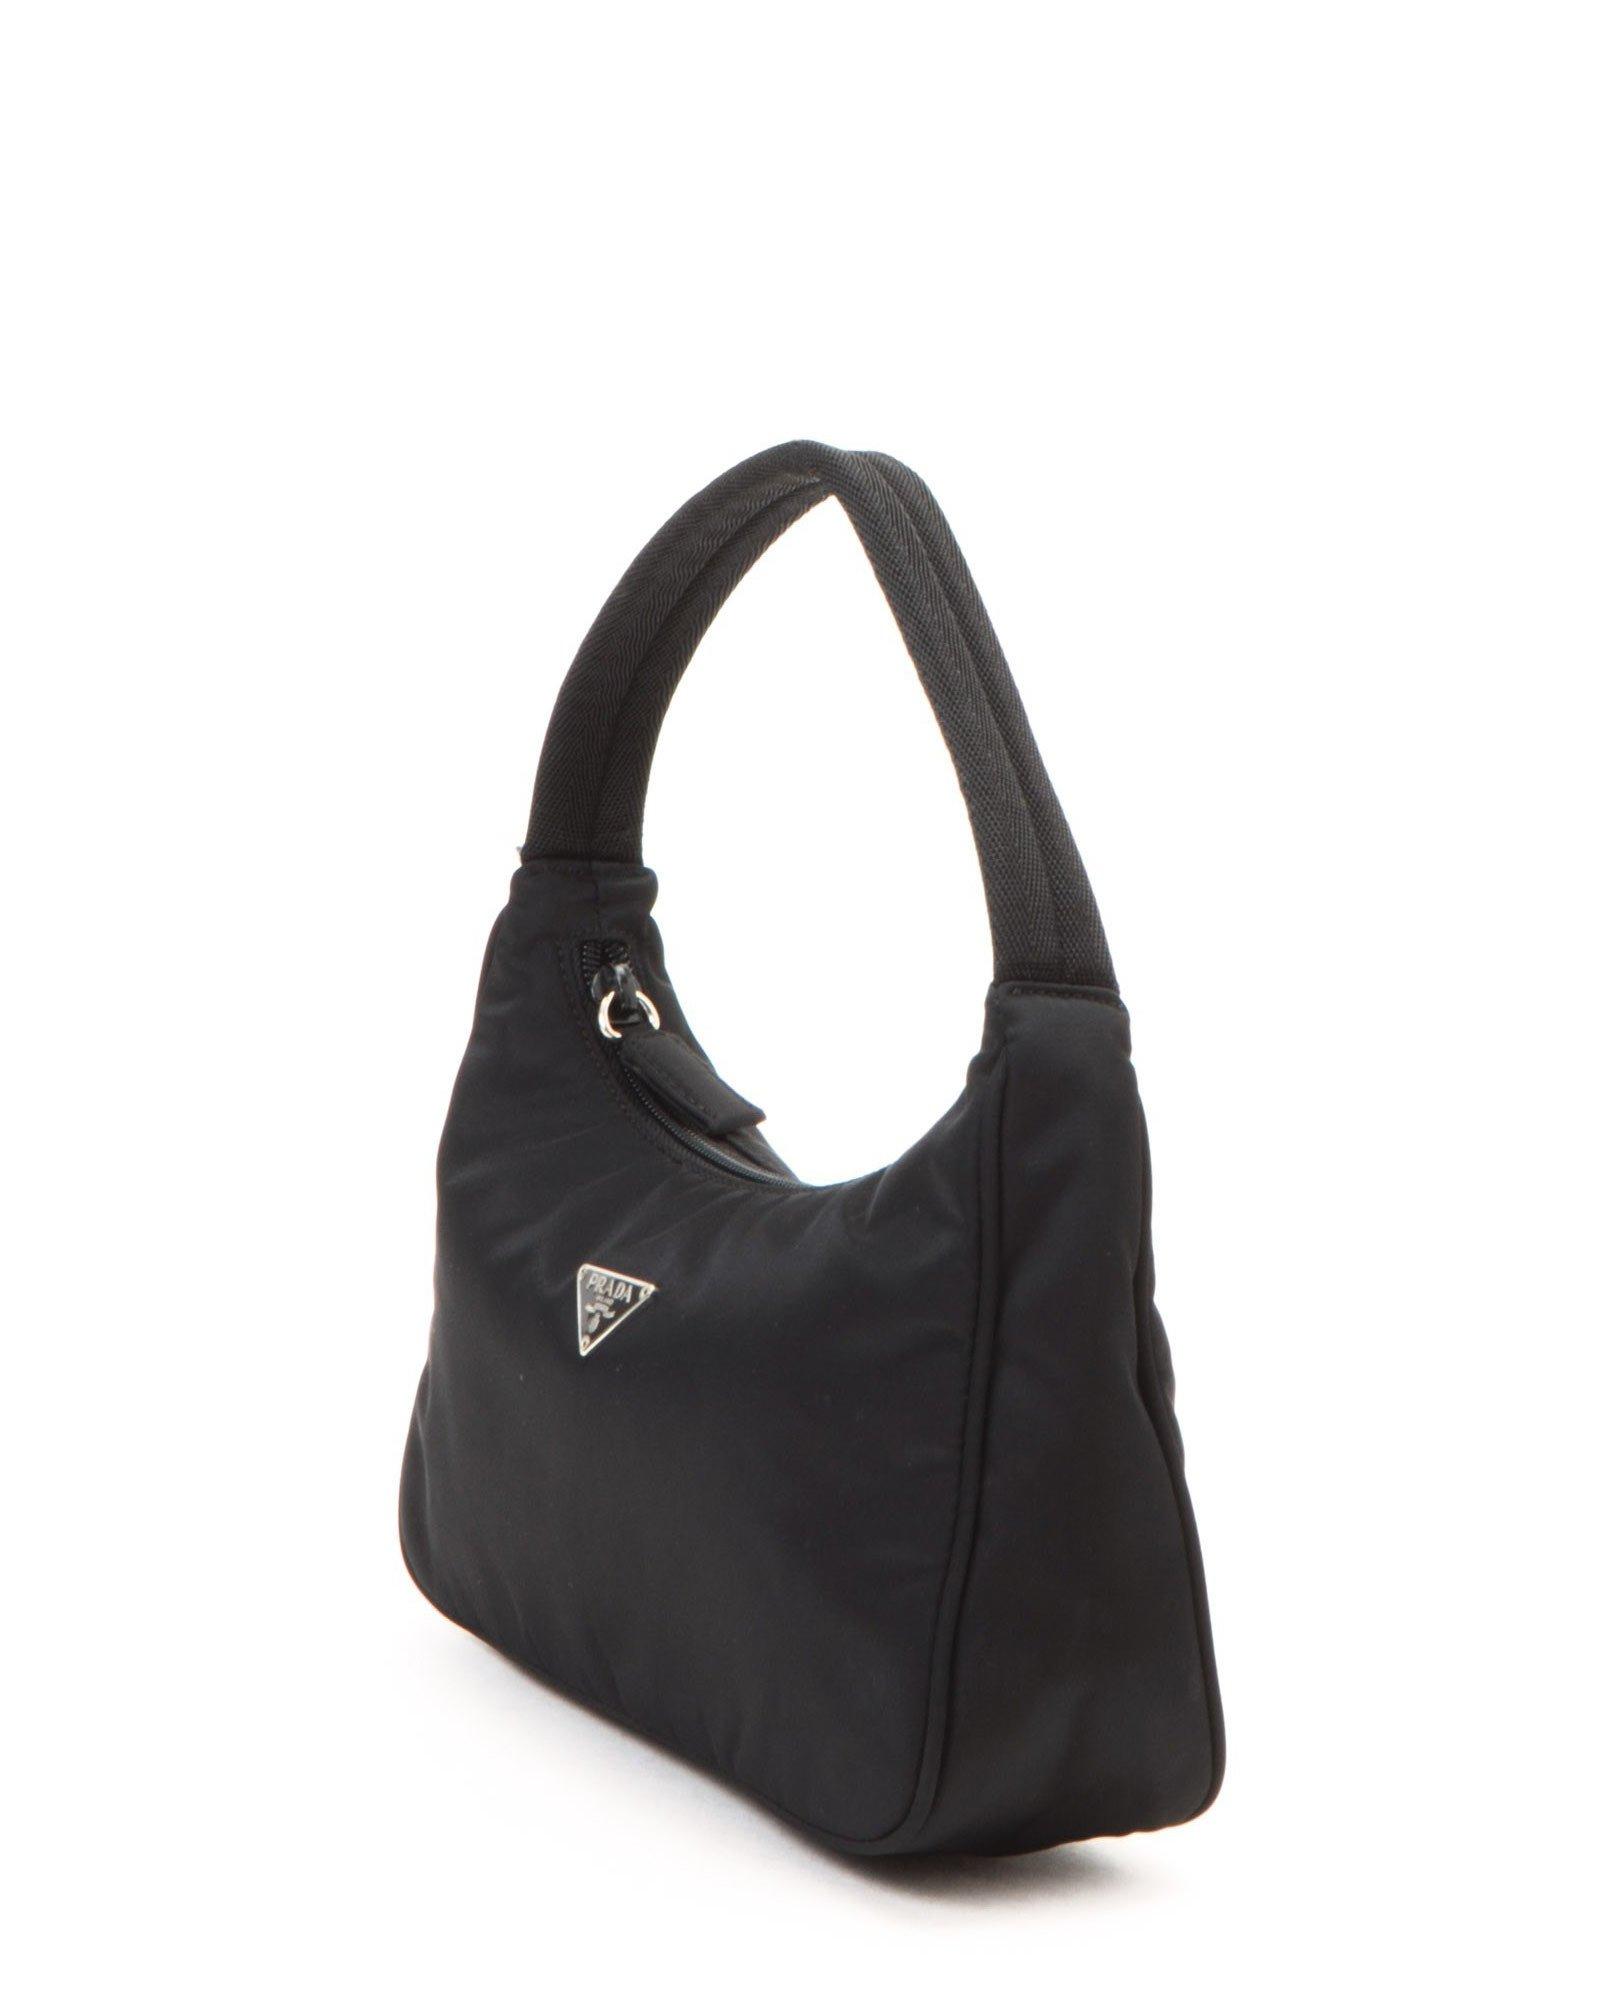 77056e035a Lyst - Prada Black Handbag - Vintage in Black